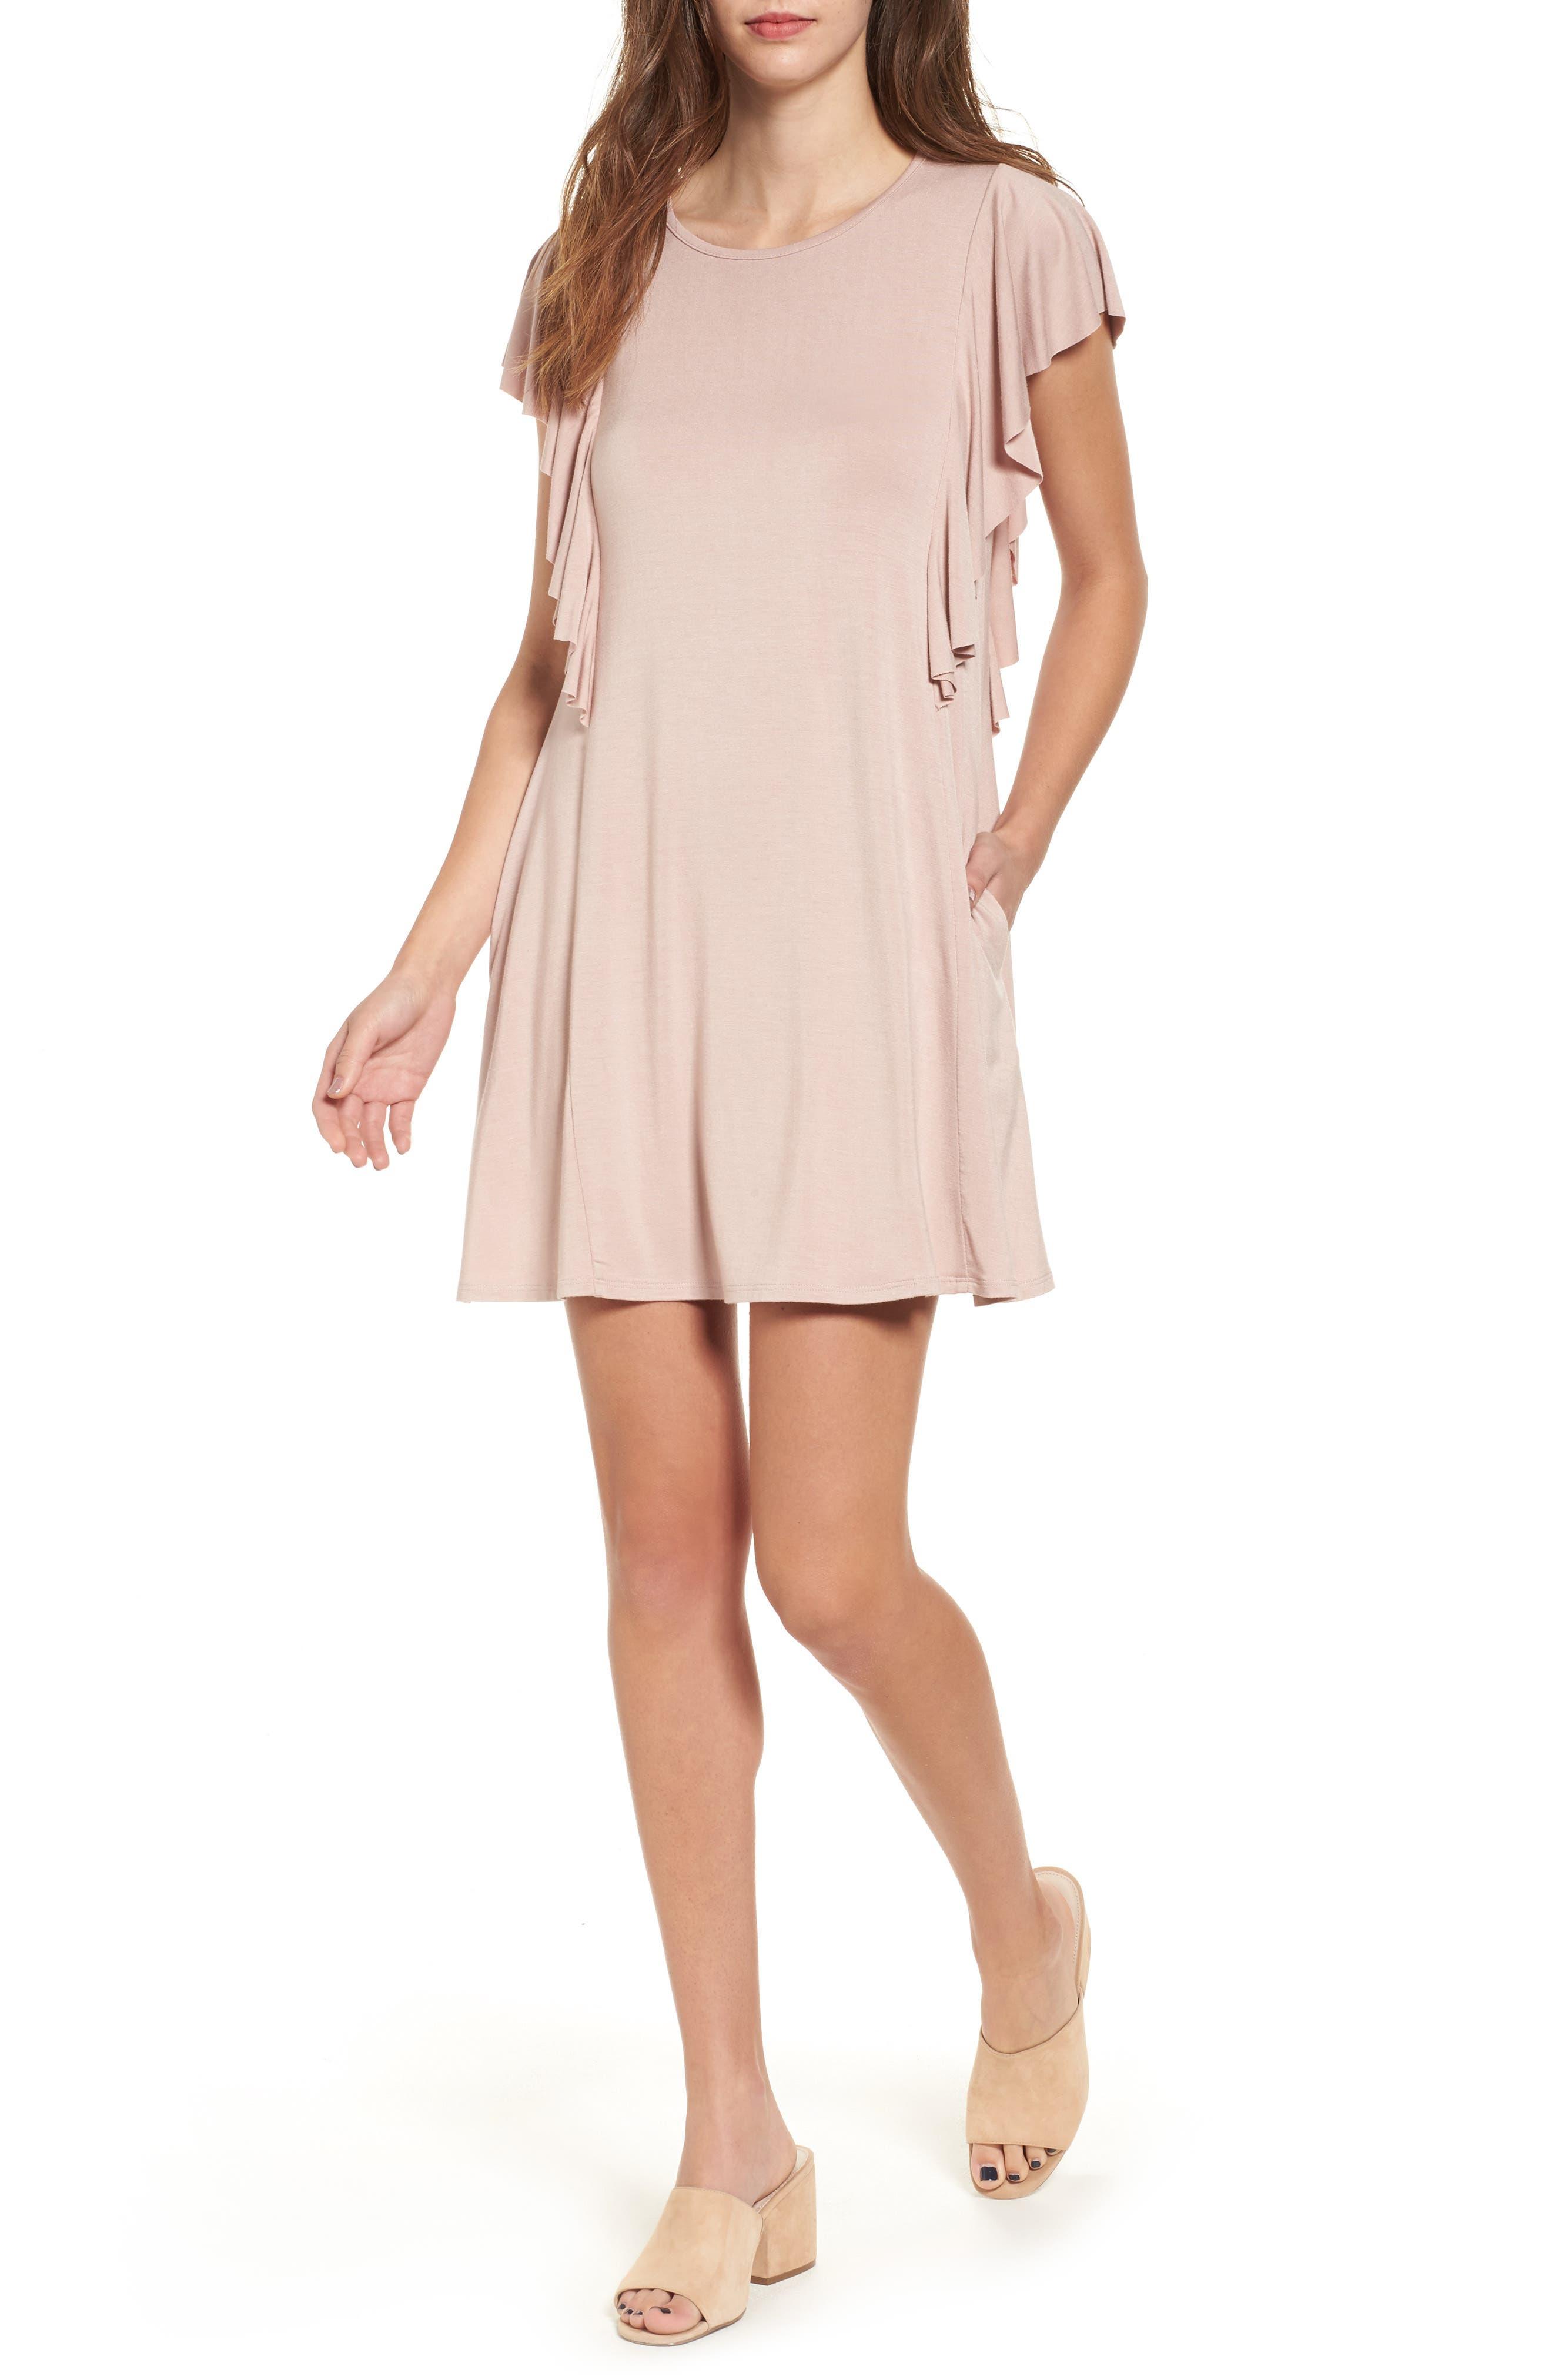 Main Image - Socialite Ruffle Sleeve T-Shirt Dress